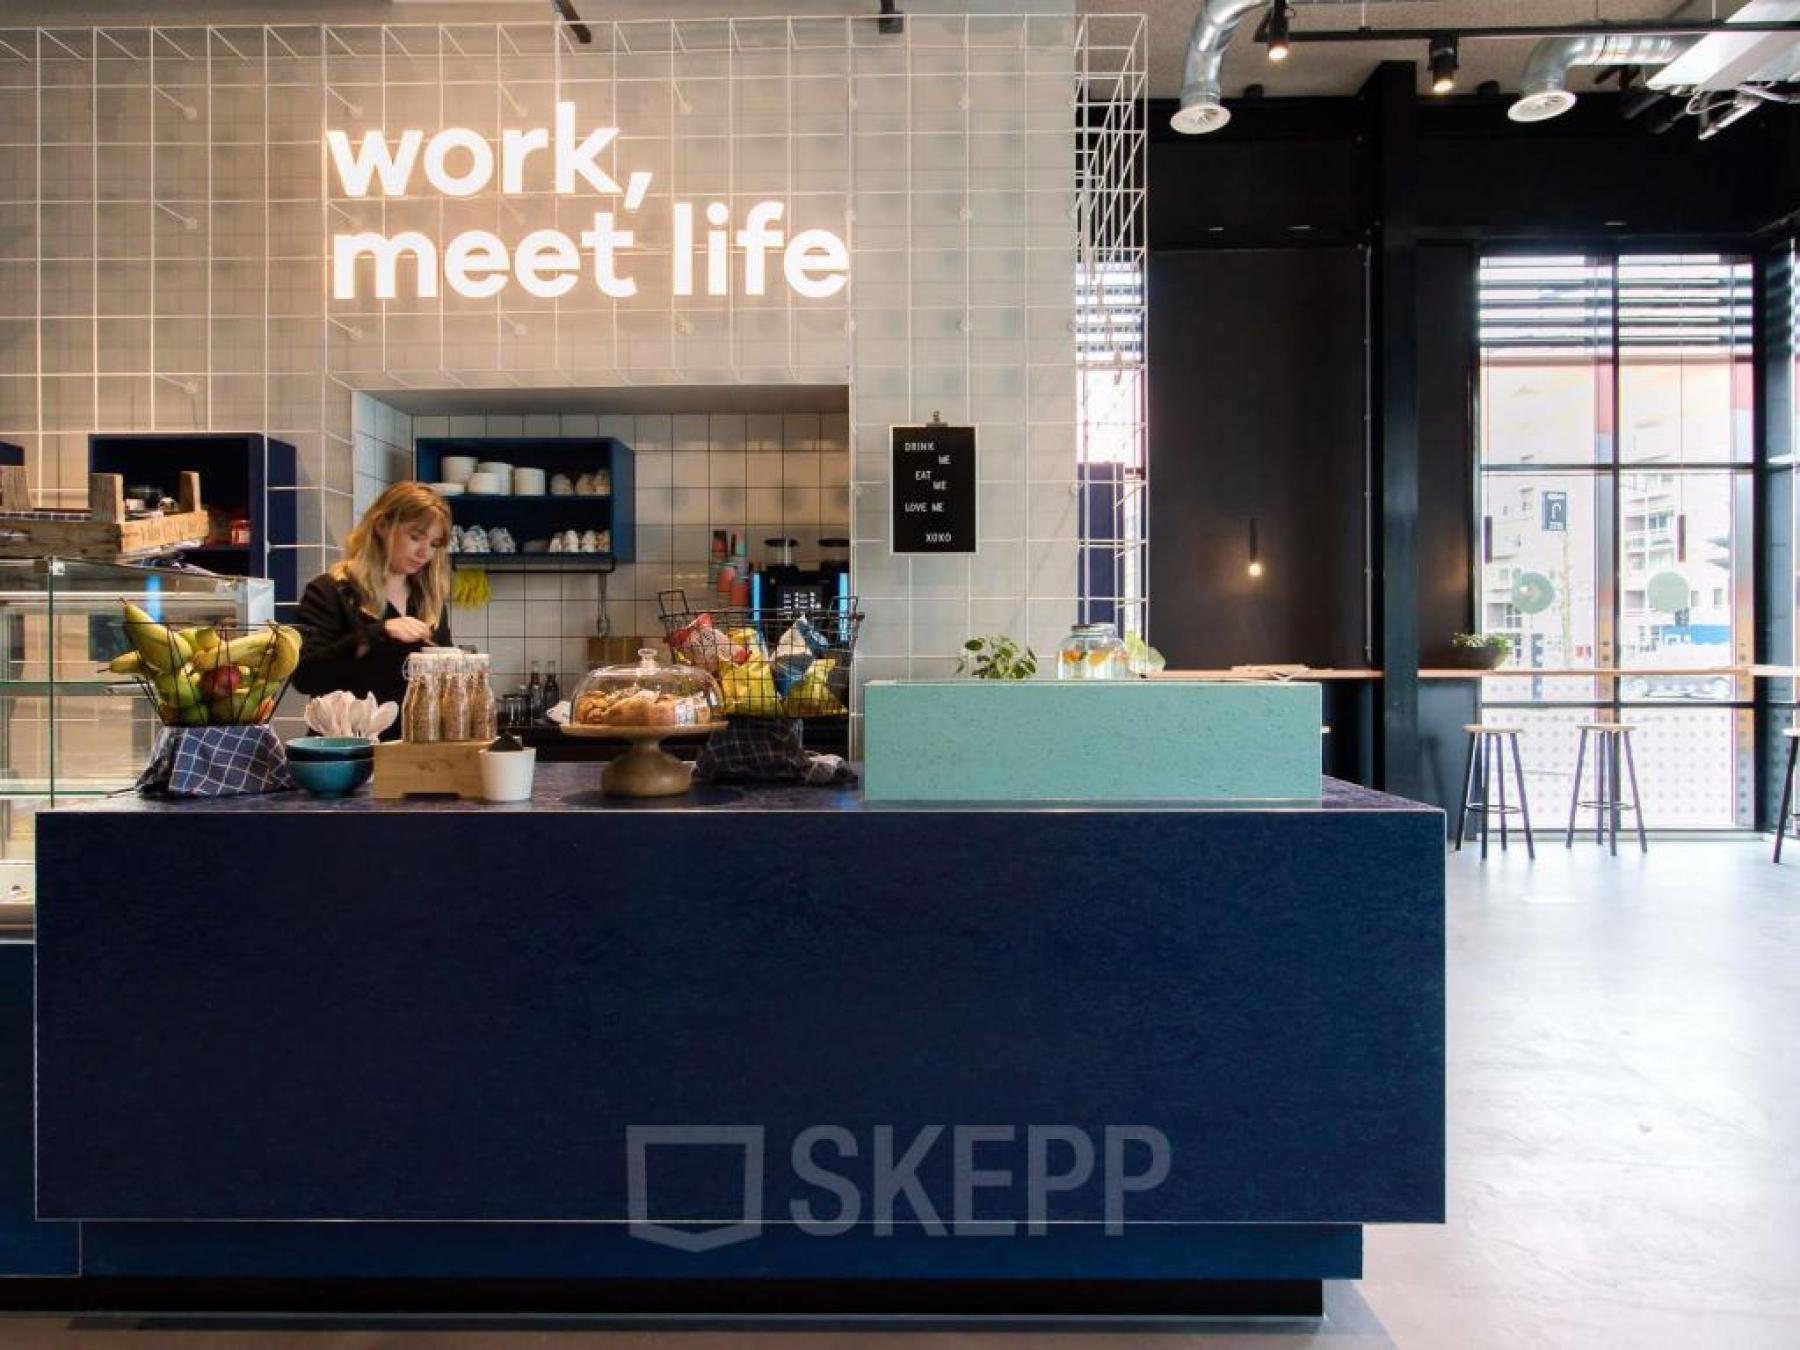 freelance werkplek huren in amsterdam centrum wibautstraat platanen 37709